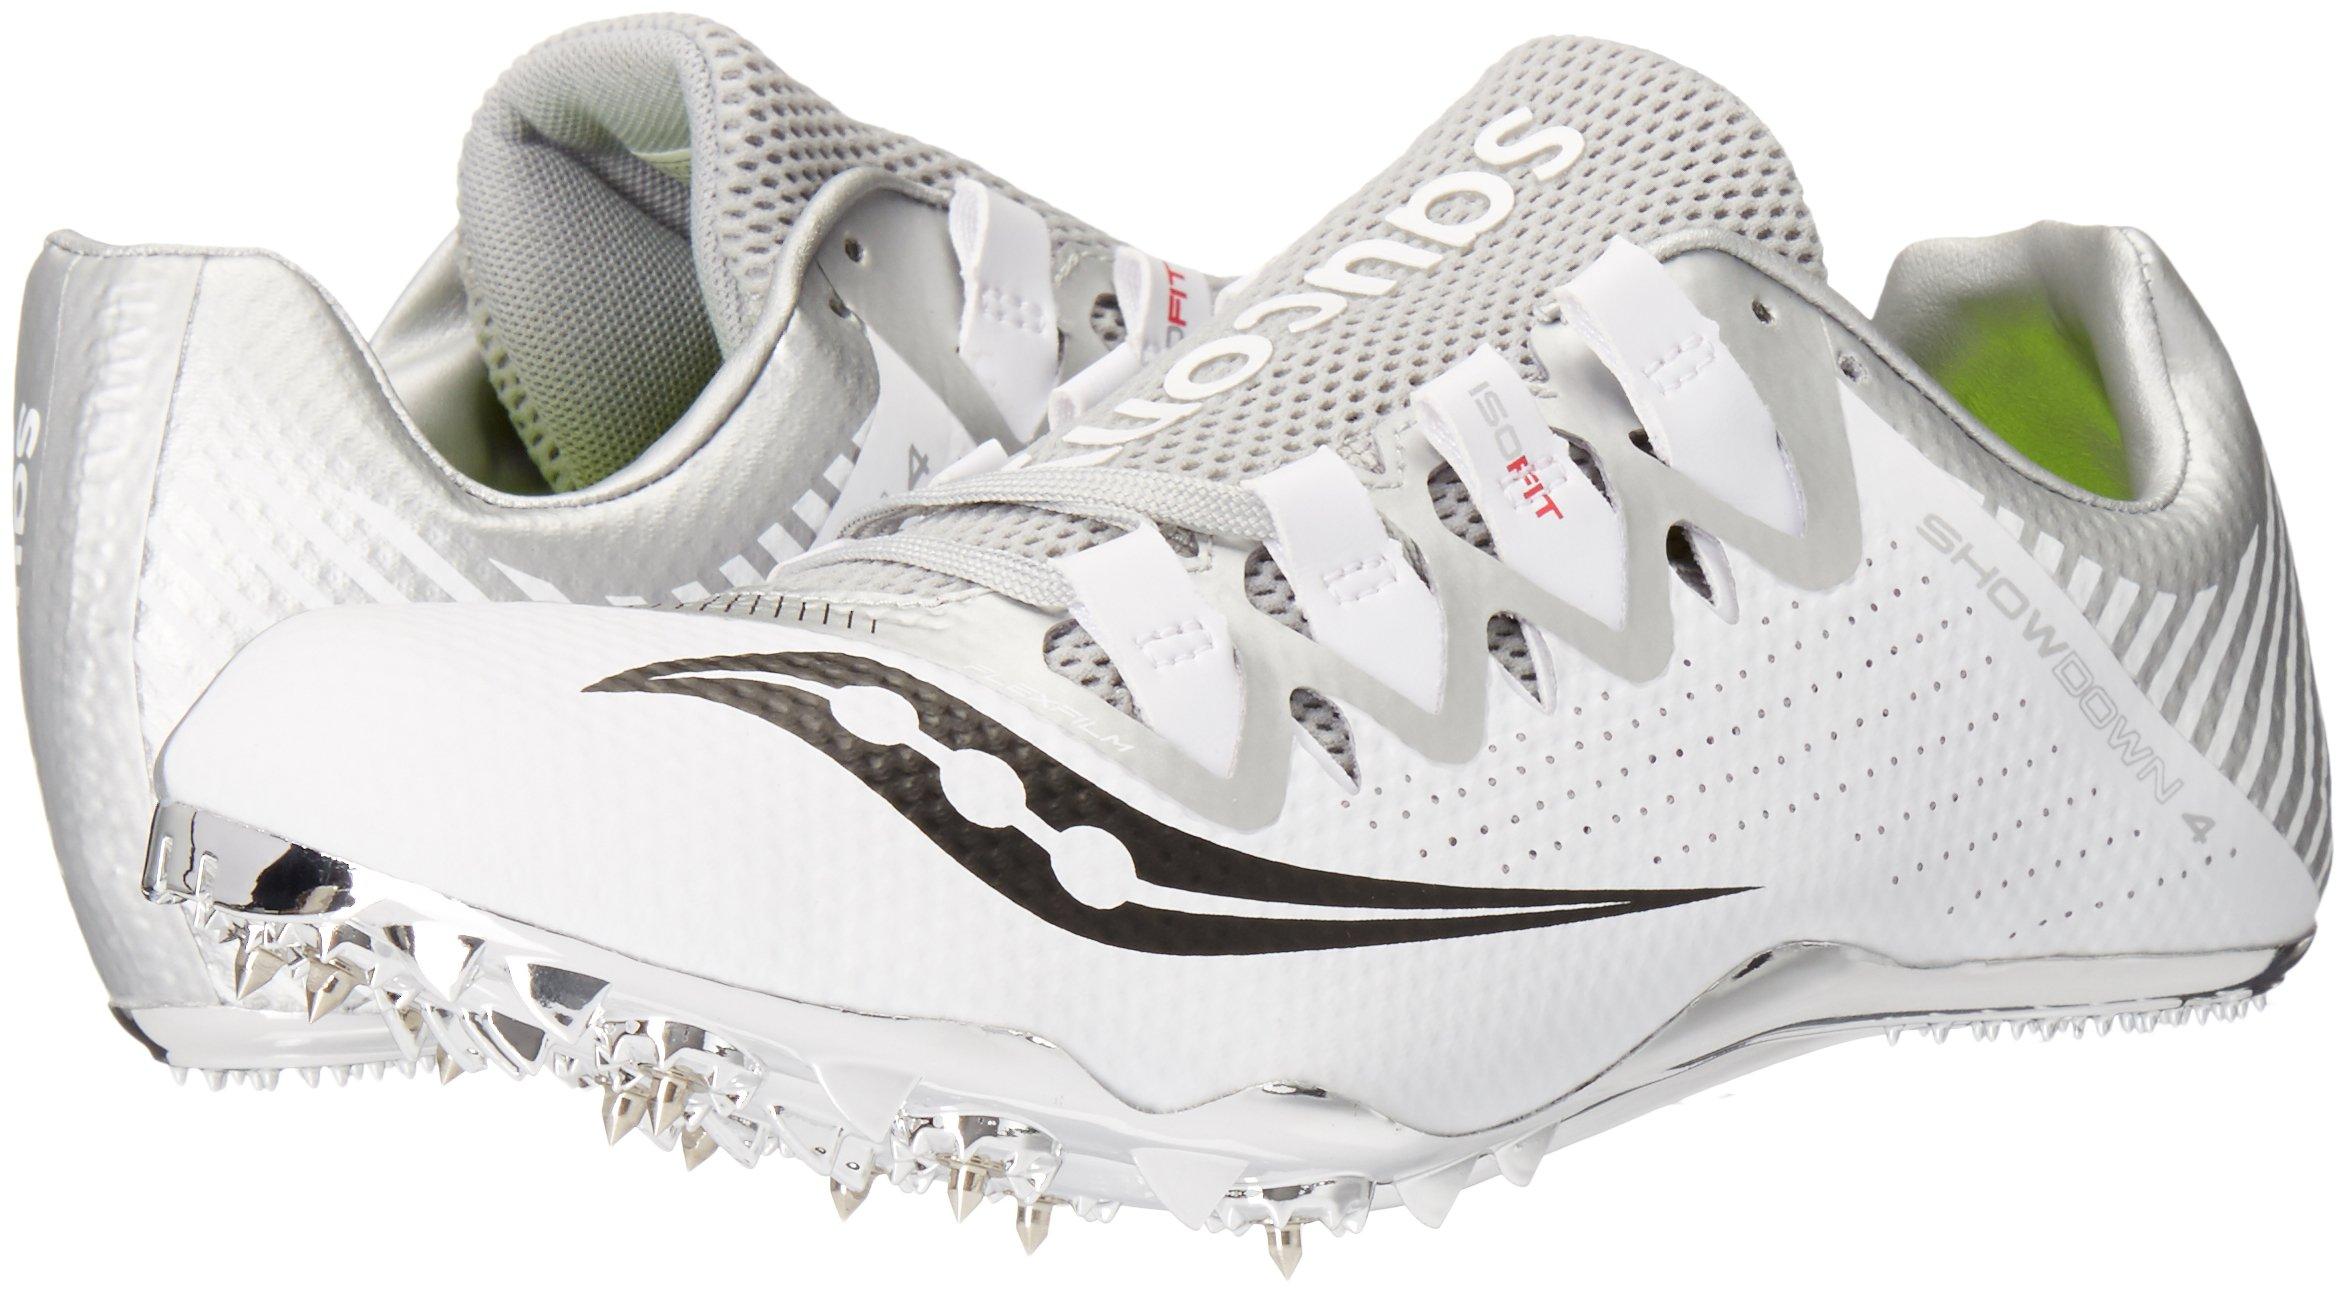 Saucony Women's Showdown 4 Track Shoe White/Silver 10 M US by Saucony (Image #6)